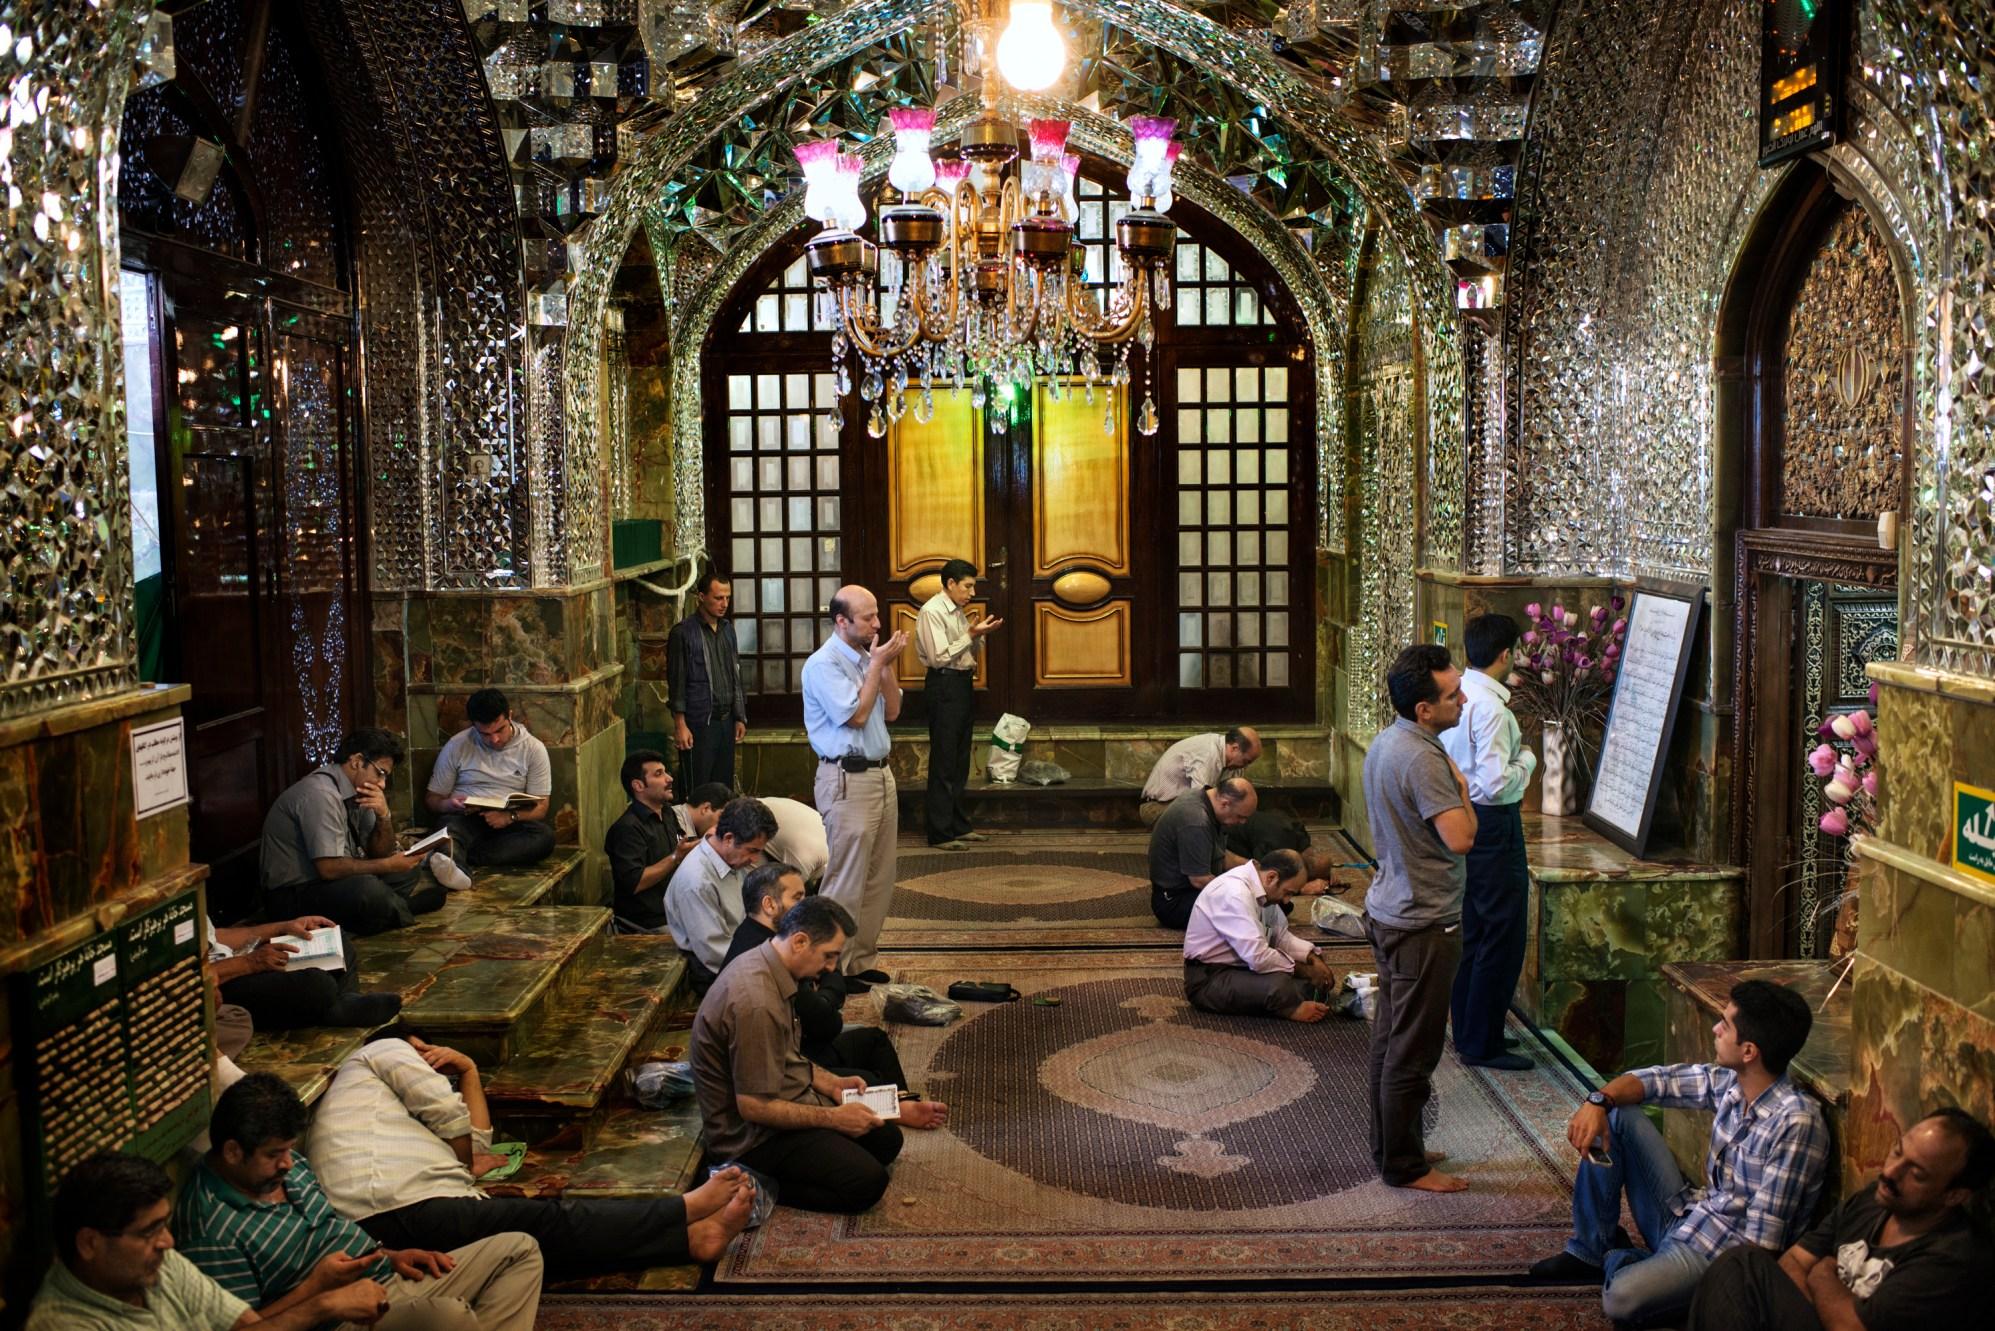 Prayers in the Imamzadeh Saleh mosque in Tajrish, Tehran.